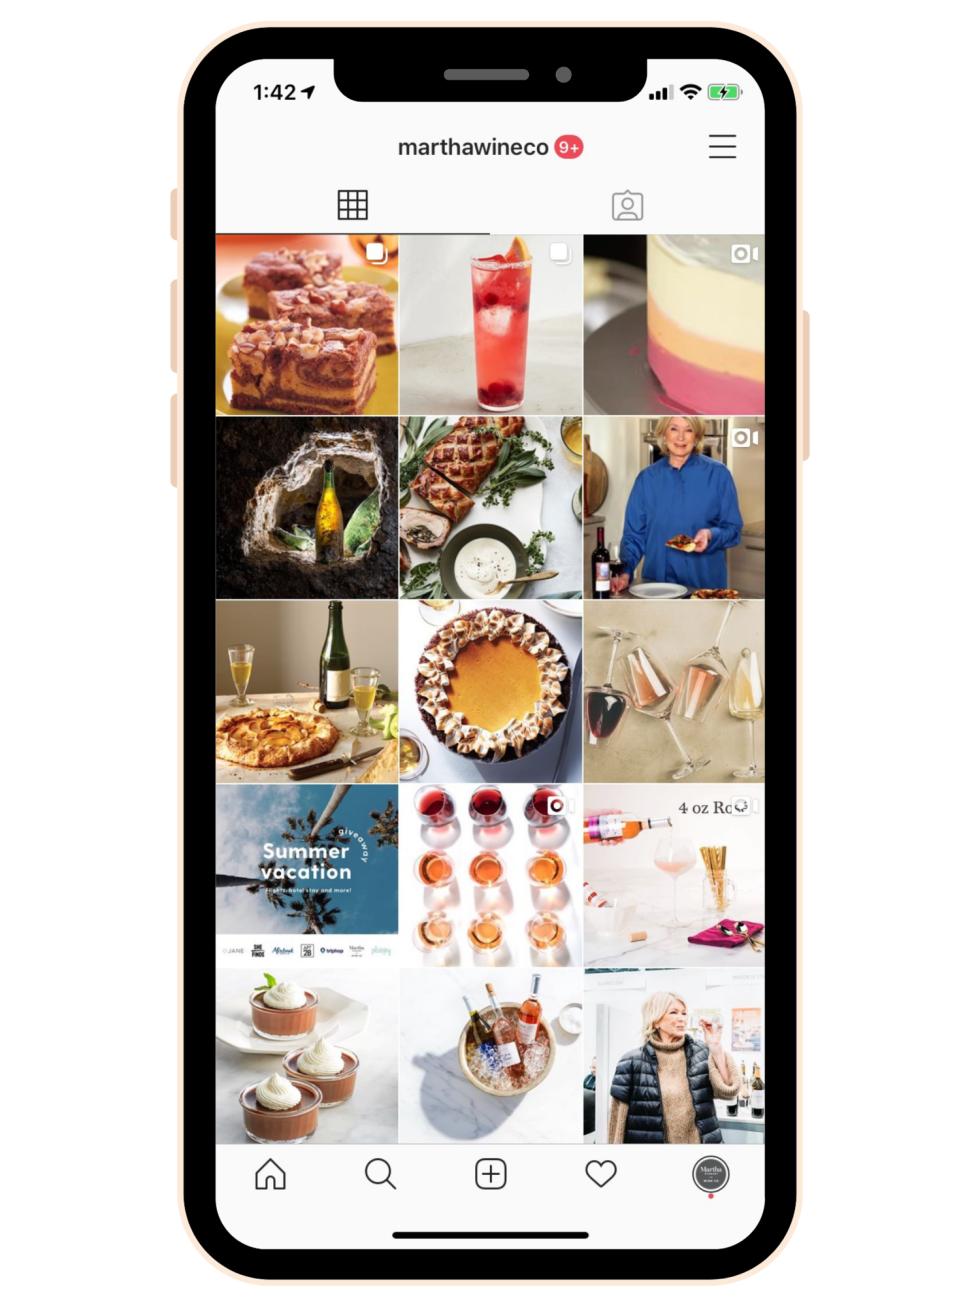 Mobile iPhone screenshot of Martha Stewart Wine Instagram page. Instagram photos include decorative photos of wine, cupcakes, Martha Stewart, and cocktails.